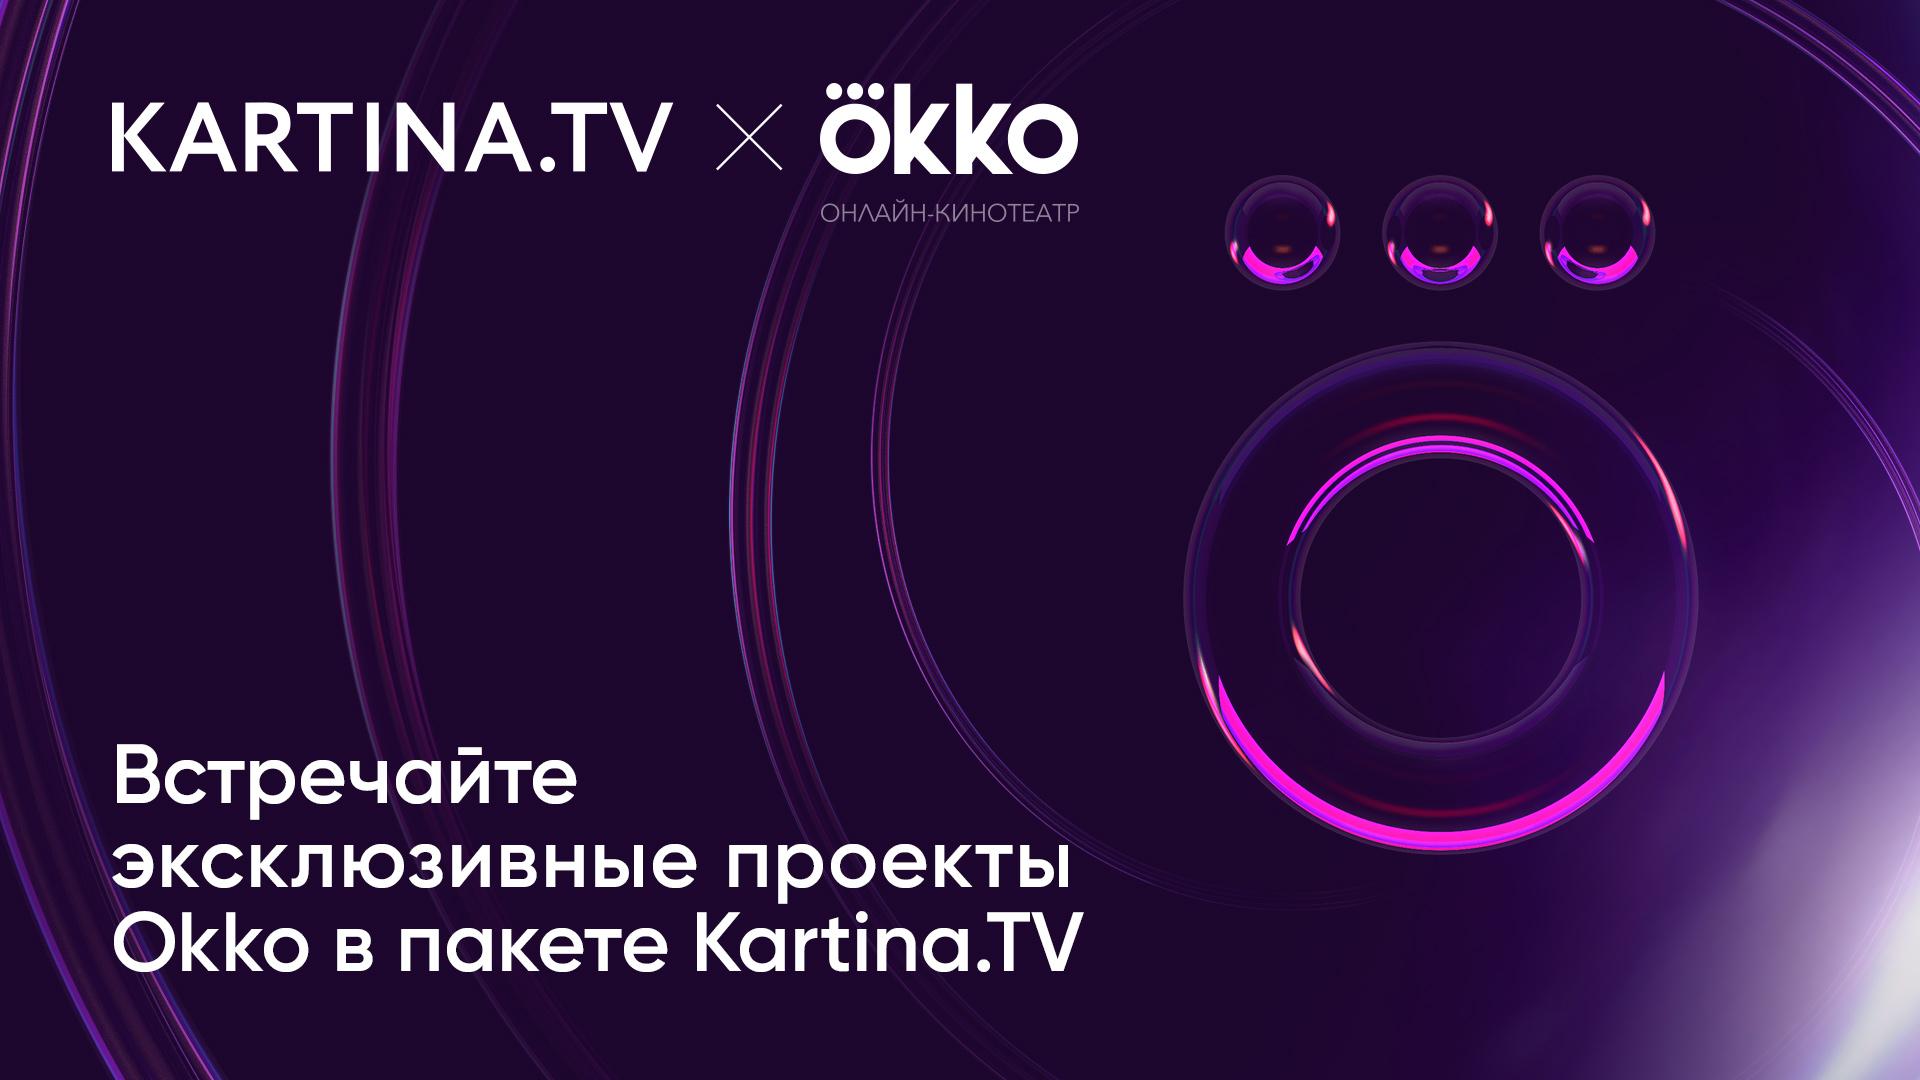 Okko доступен зрителям Kartina.TV!